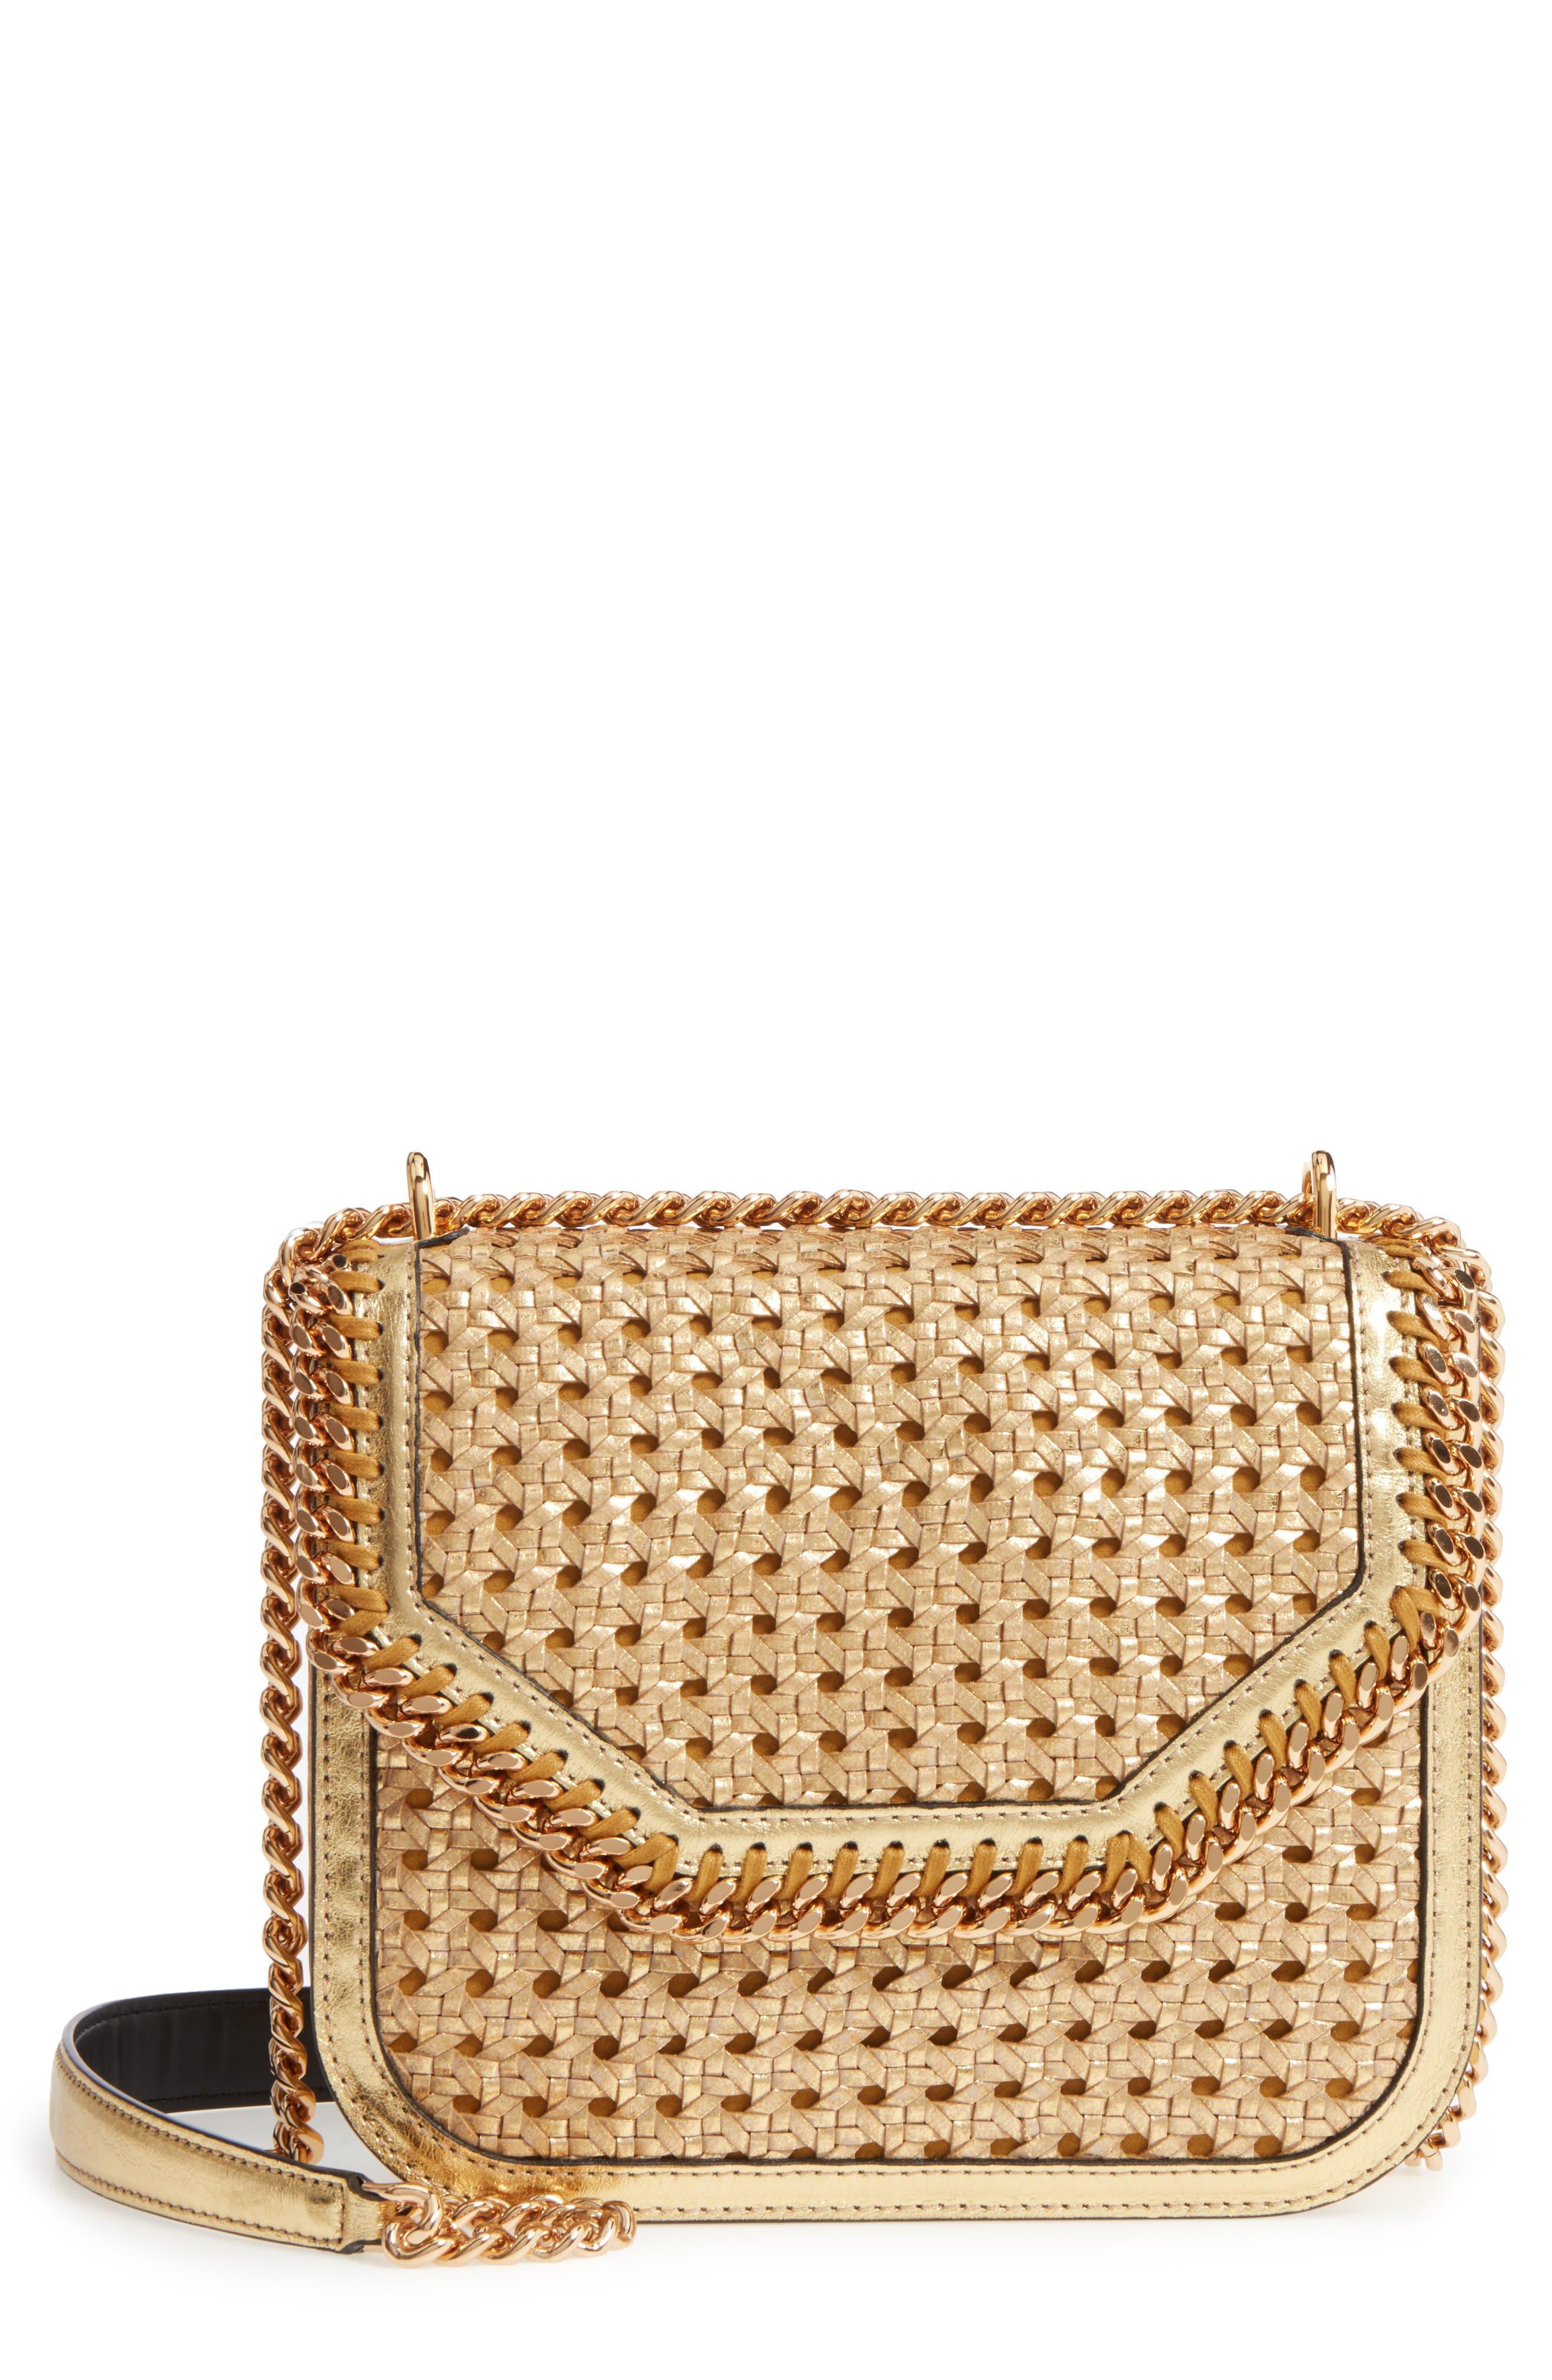 Stella McCartney Falabella Woven Metallic Faux Leather Shoulder Bag